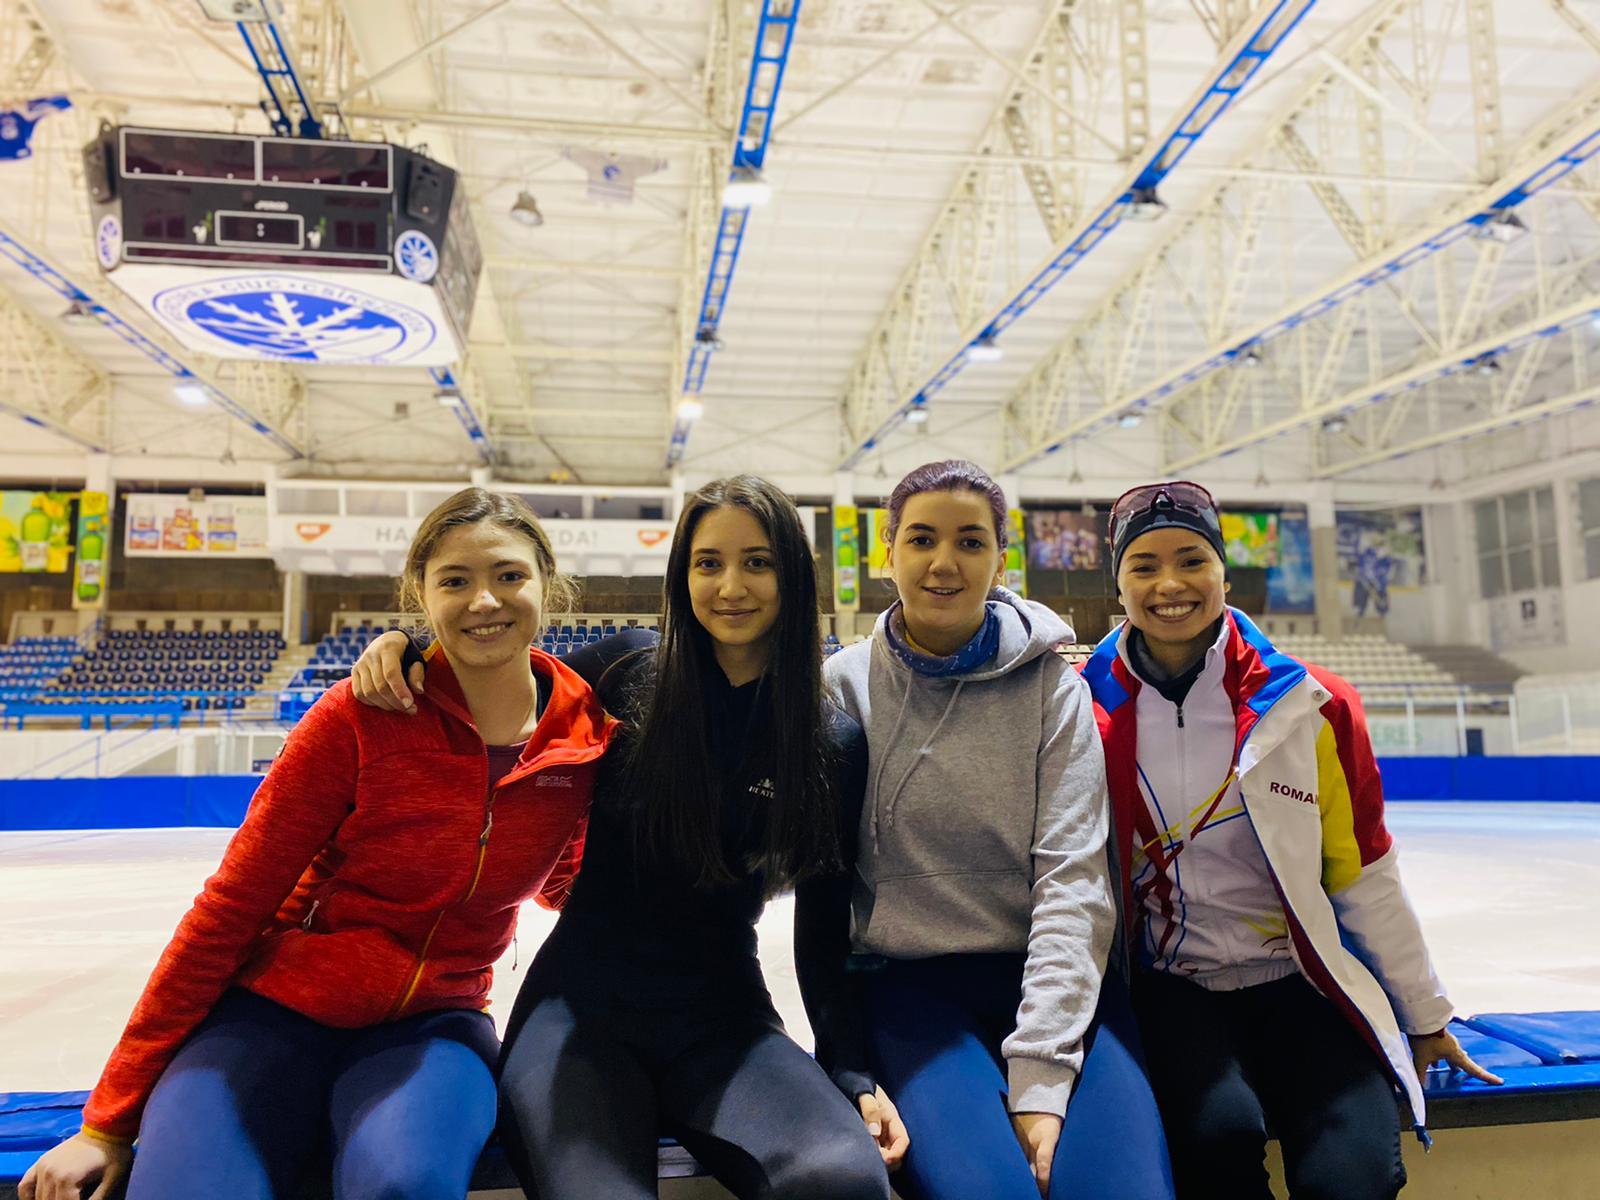 Alexia Neag, Andreea Moldovan, Iasmin Al-Sagban, Raluca Ștef